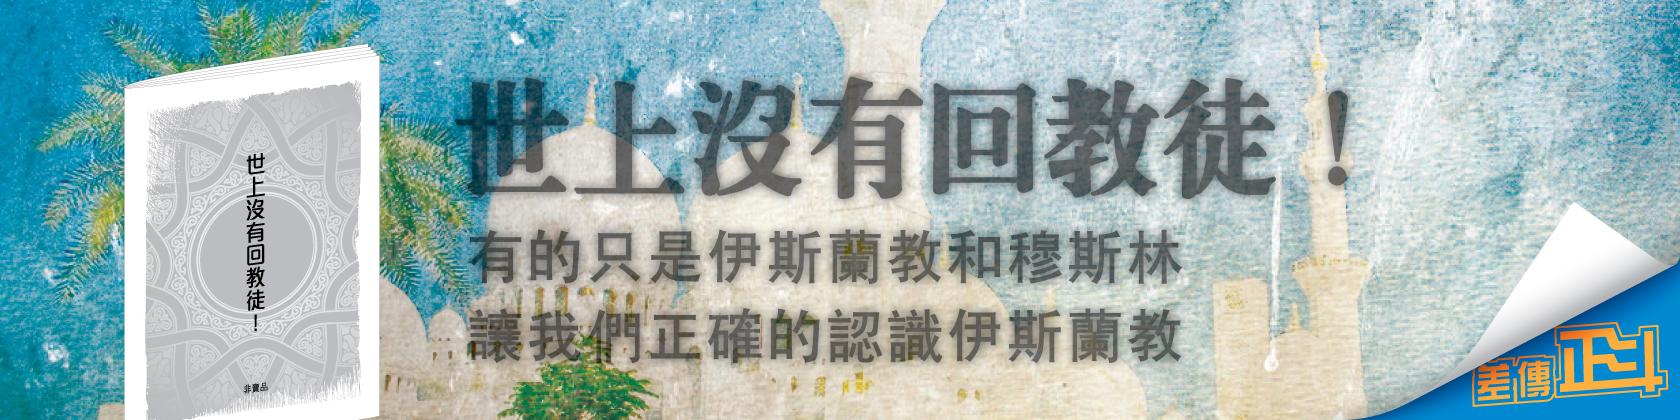 CB-01-web-banner-1680-x-420-B2-07